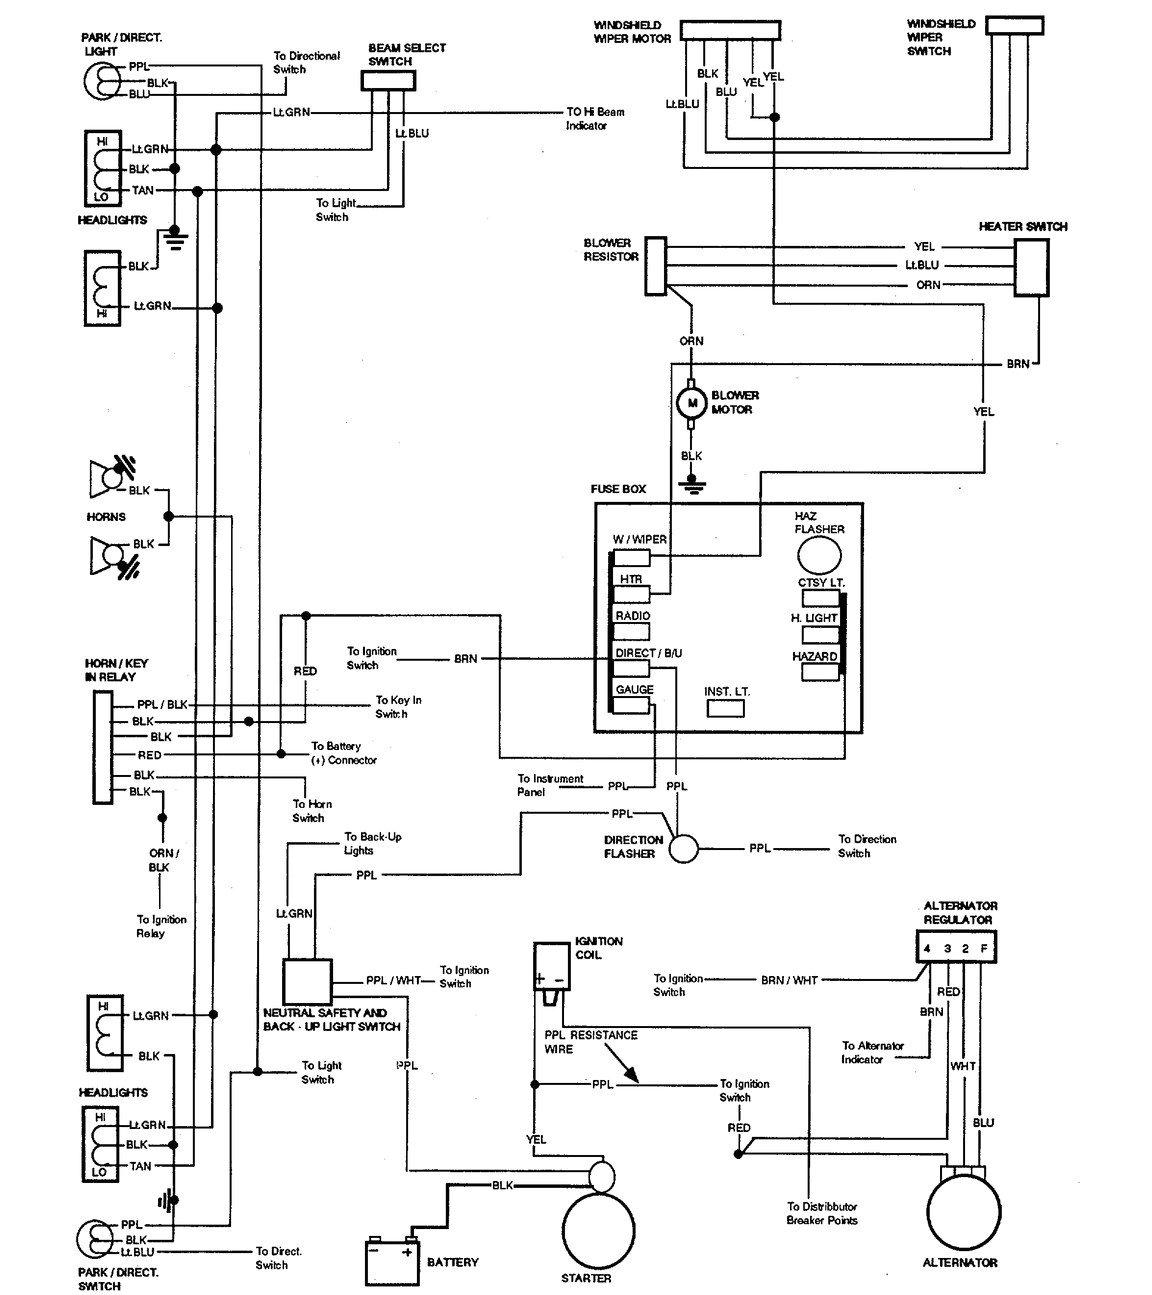 wiring diagram for 87 chevy monte carlo premium wiring diagram blog 1985 monte carlo wiring diagram